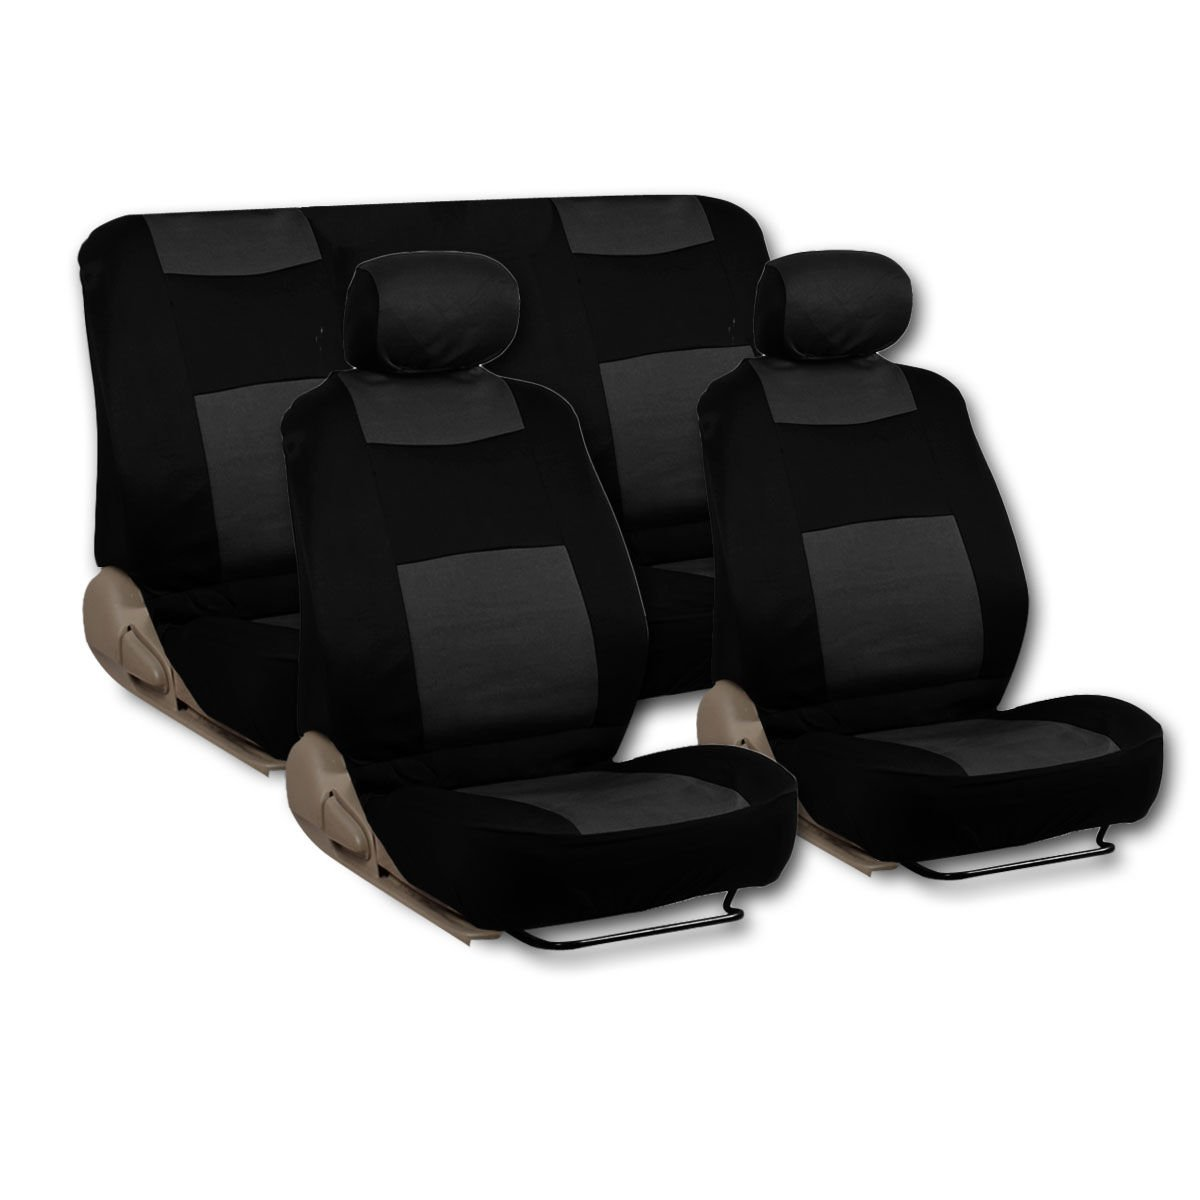 Black Type R 9 Piece Front Car Seat Rear Bench Head Rest